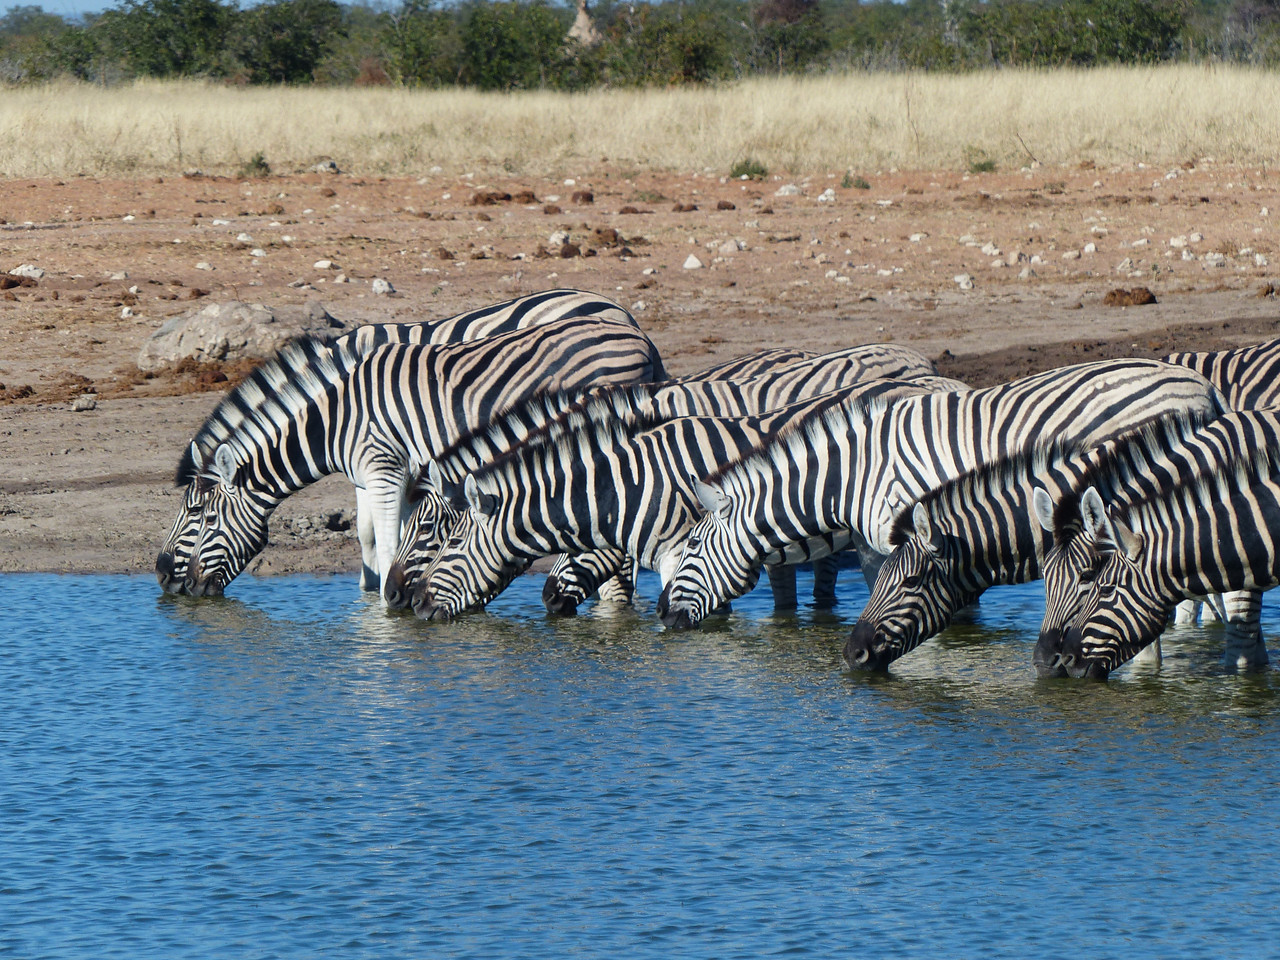 I like zebras